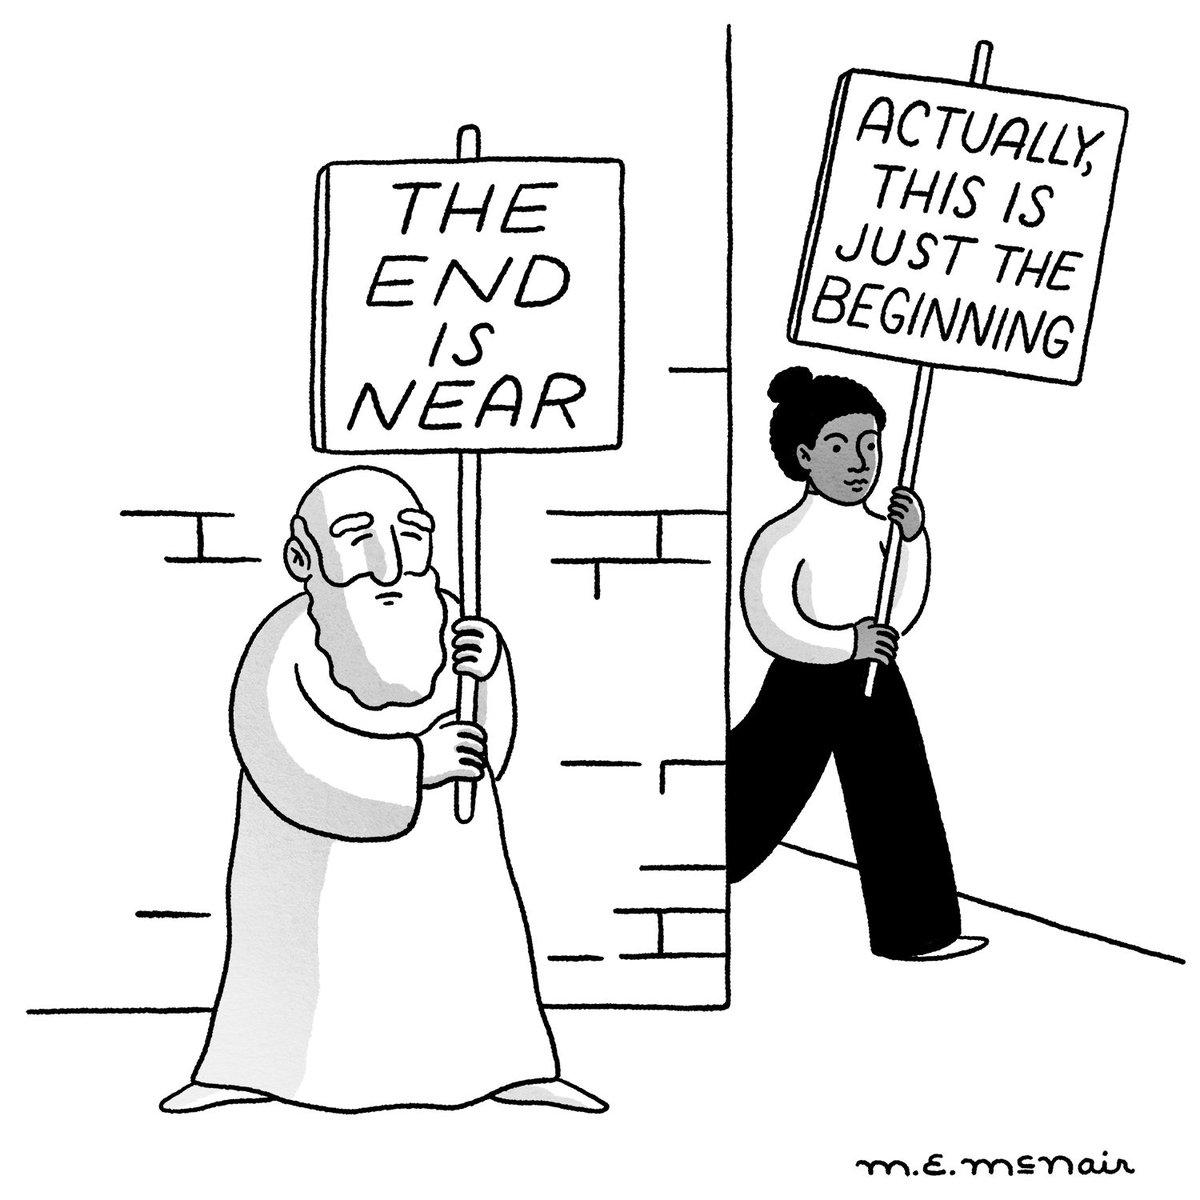 A cartoon by Elisabeth McNair. https://t.co/ia9Yb1Kf1T